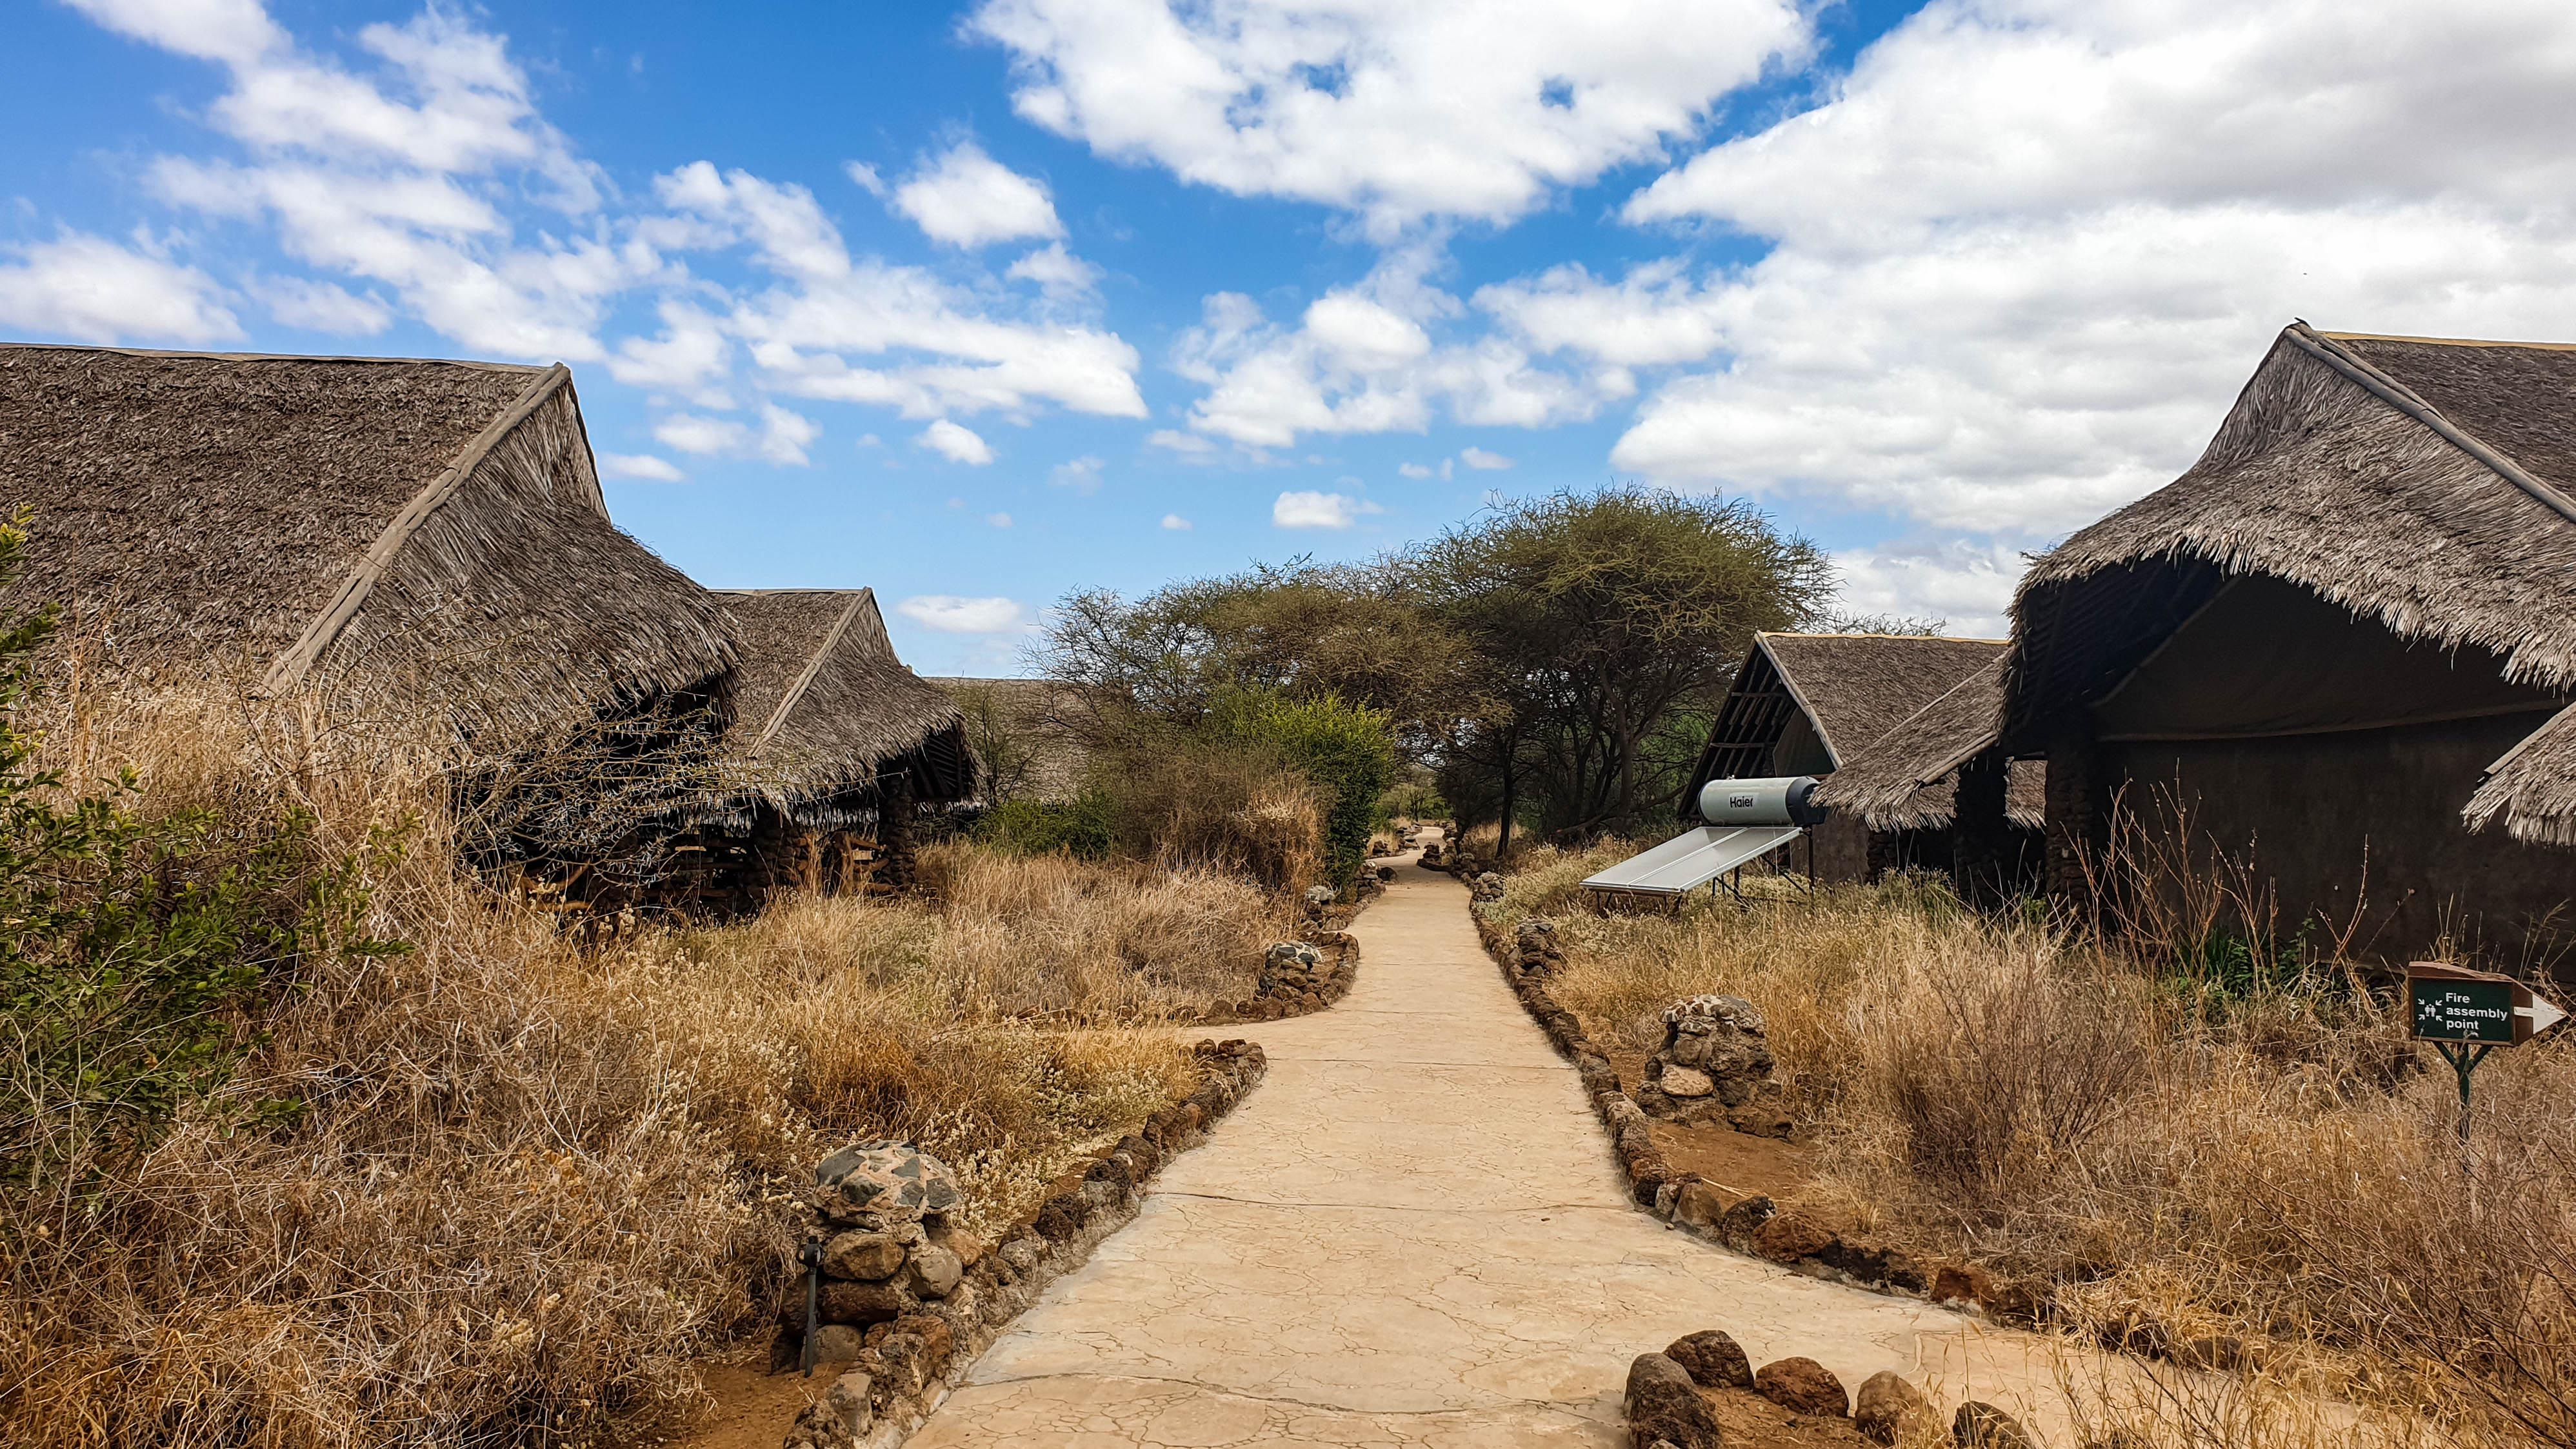 Cabañas en Kibo Safari Camp, Amboseli, Kenia